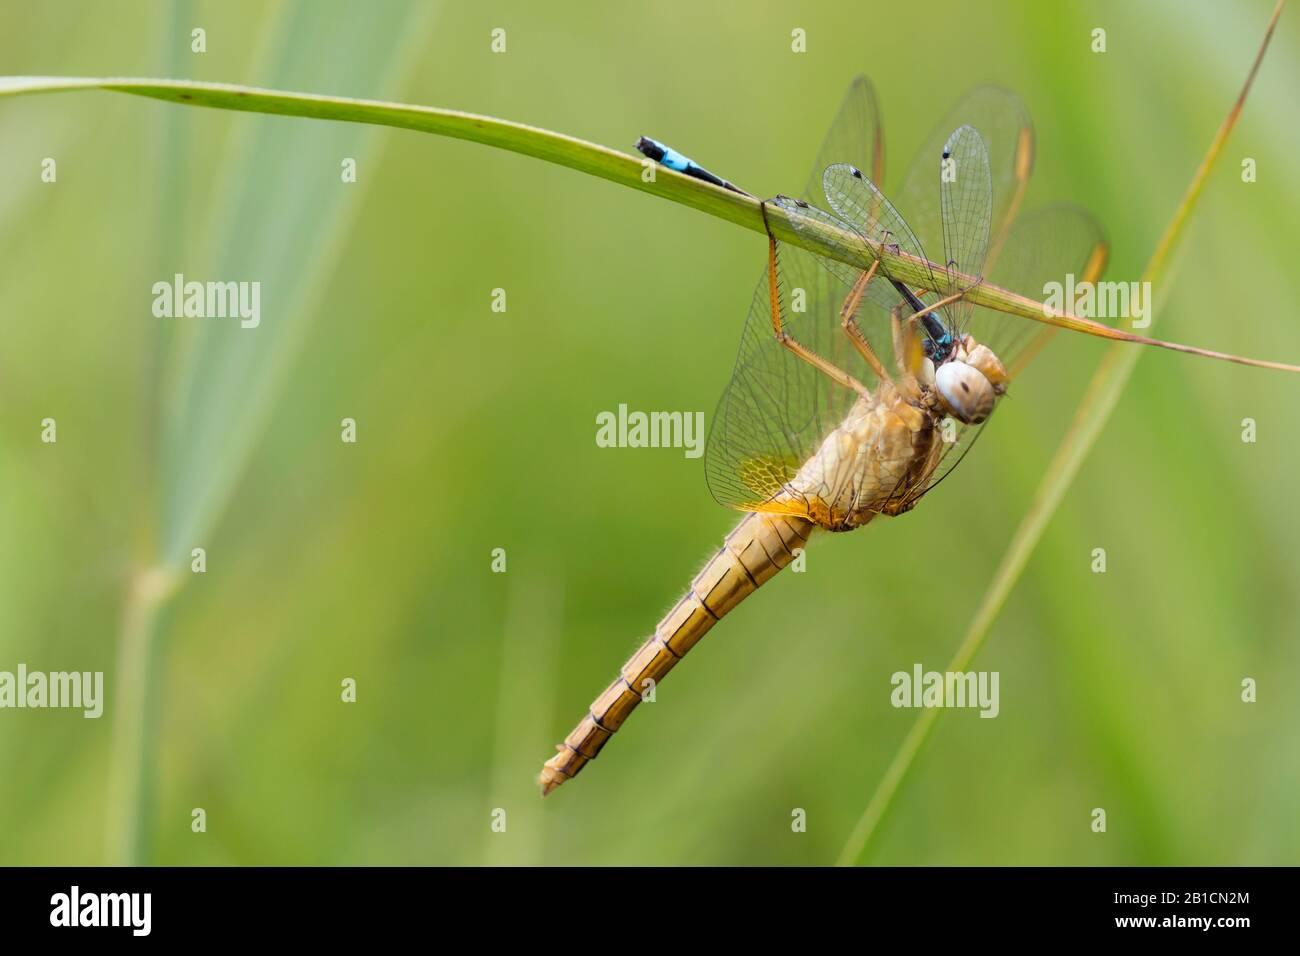 Broad Scarlet, Common Scarlet-darter, Scarlet Darter, Scarlet Dragonfly (Crocothemis erythraea, Croccothemis erythraea), female with prey, Netherlands, Overijssel, Weerribben-Wieden National Park Stock Photo